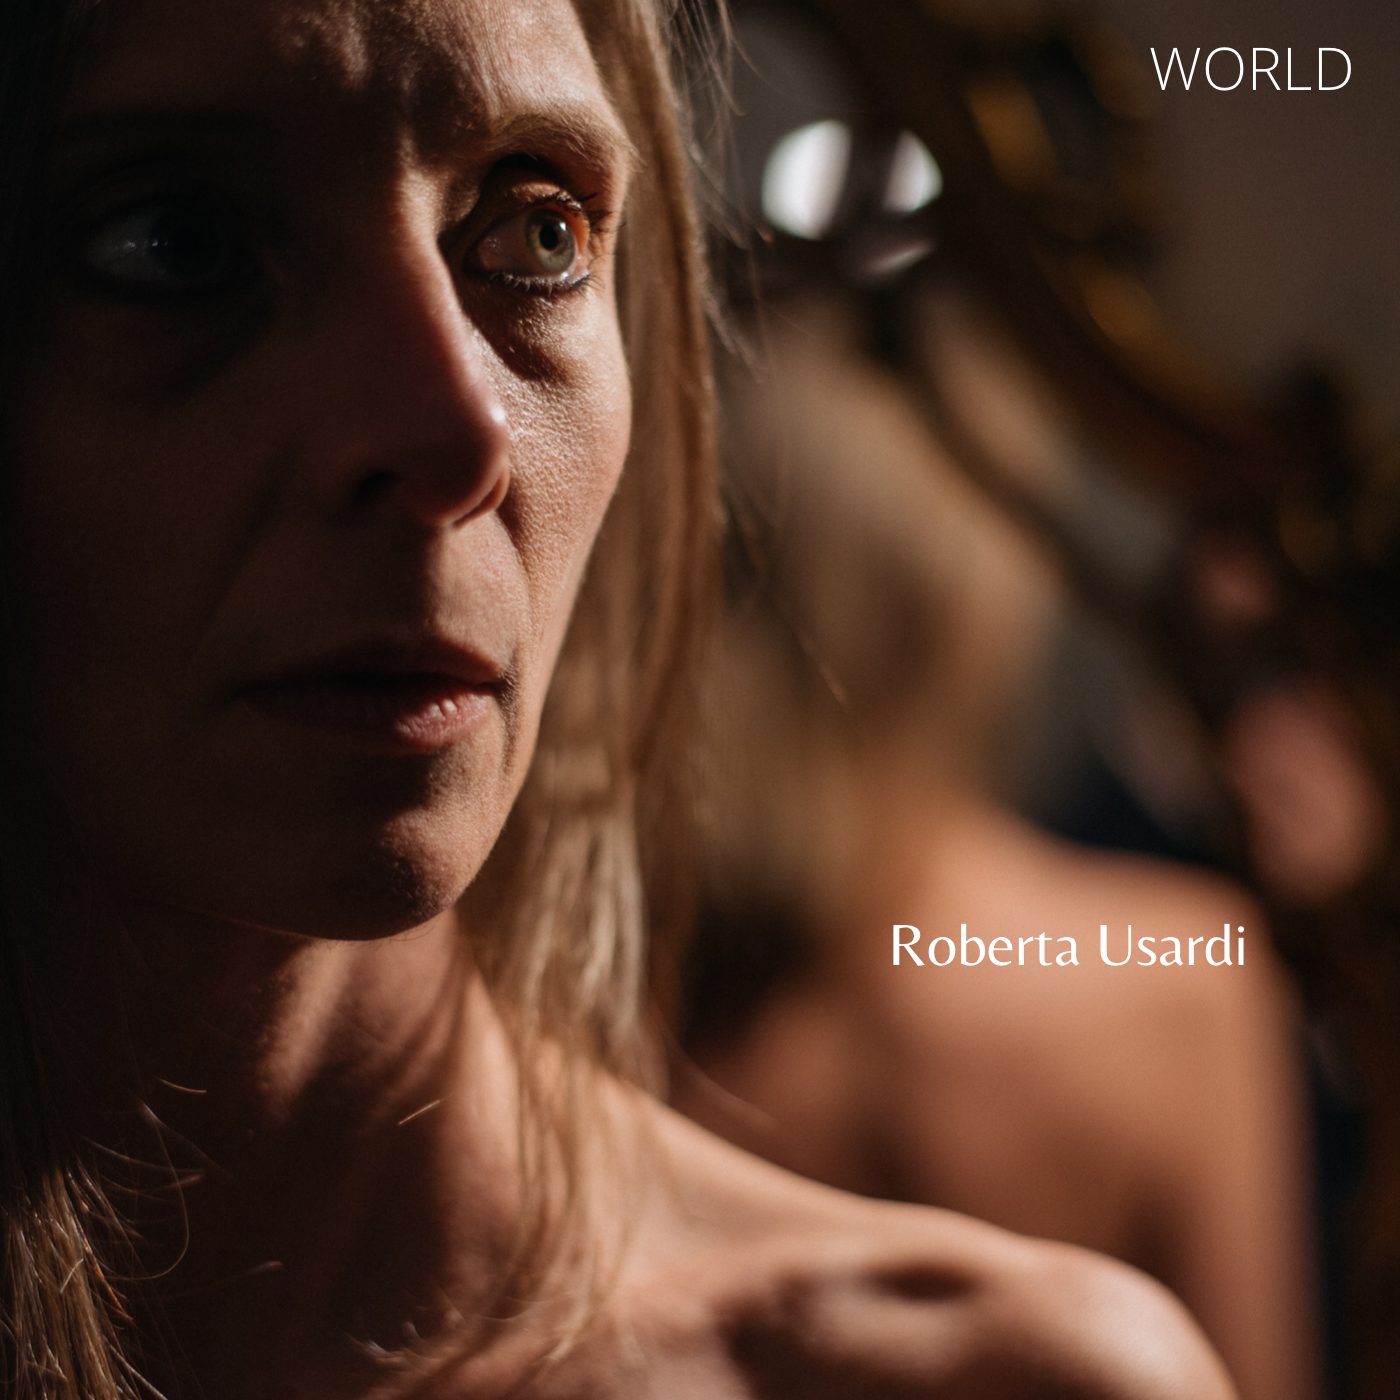 Roberta Usardi presenta il suo nuovo ep